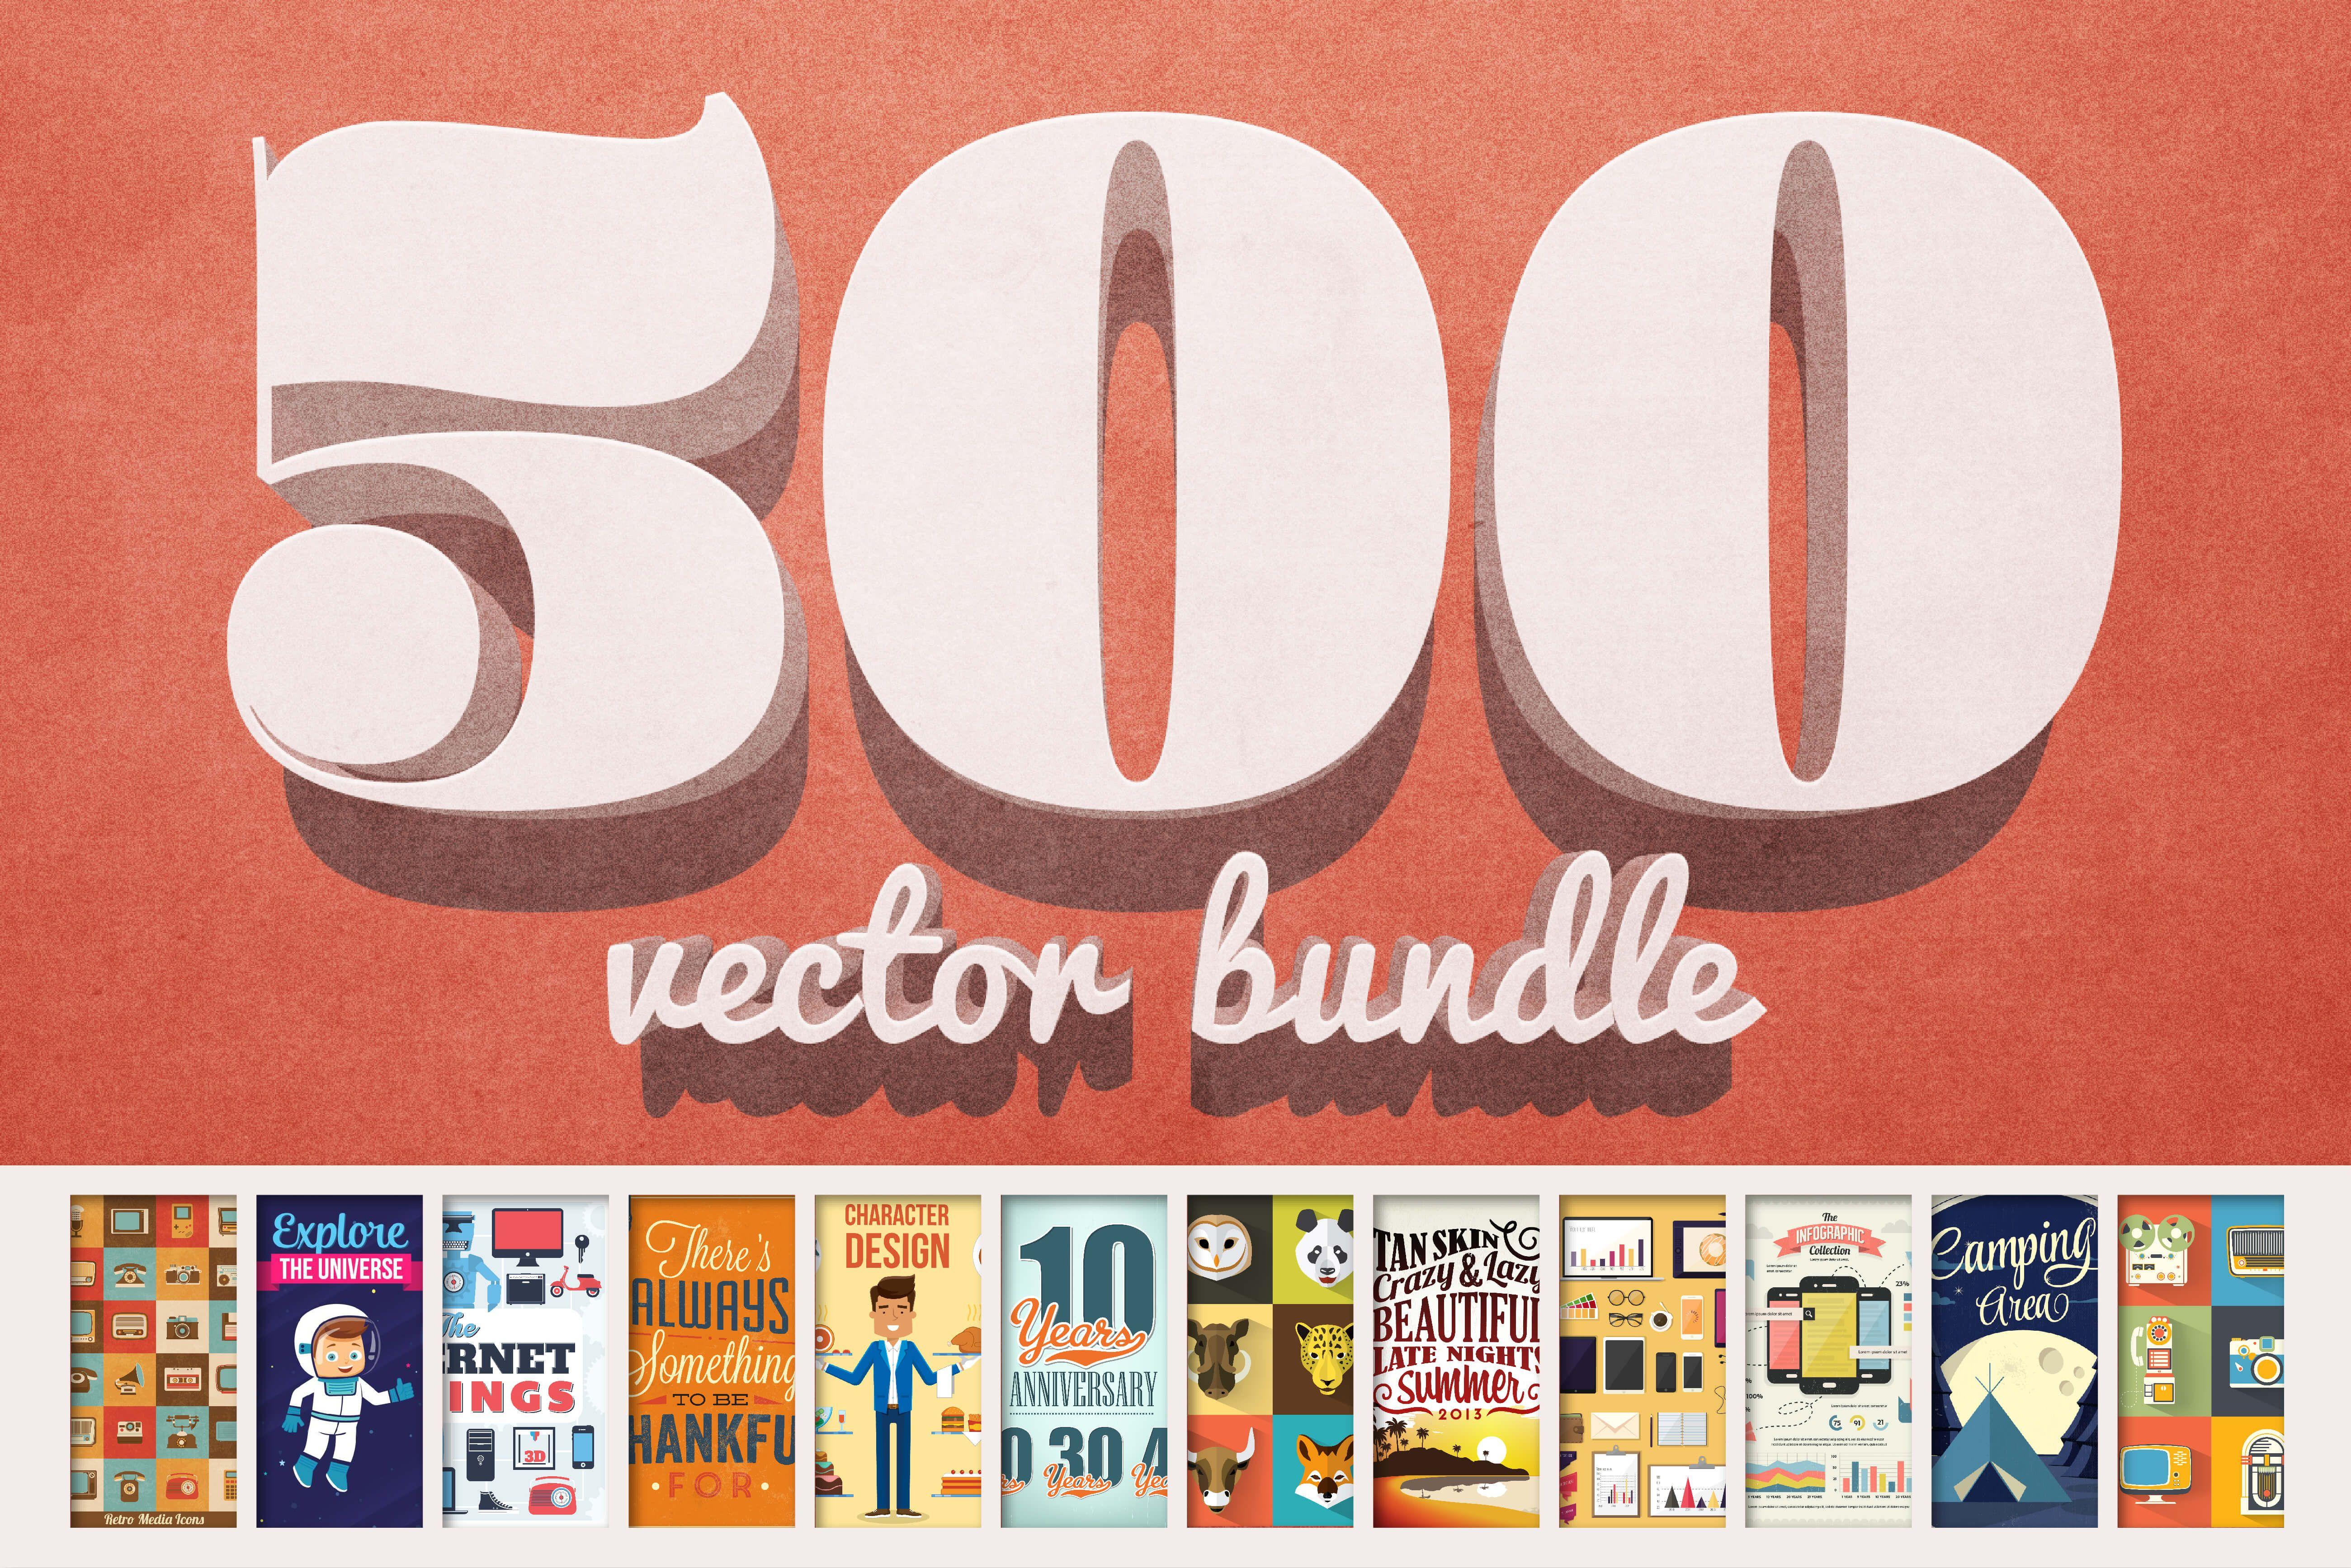 Vectorlicious Bundle 2500 Worth Of Premium Quality Vectors